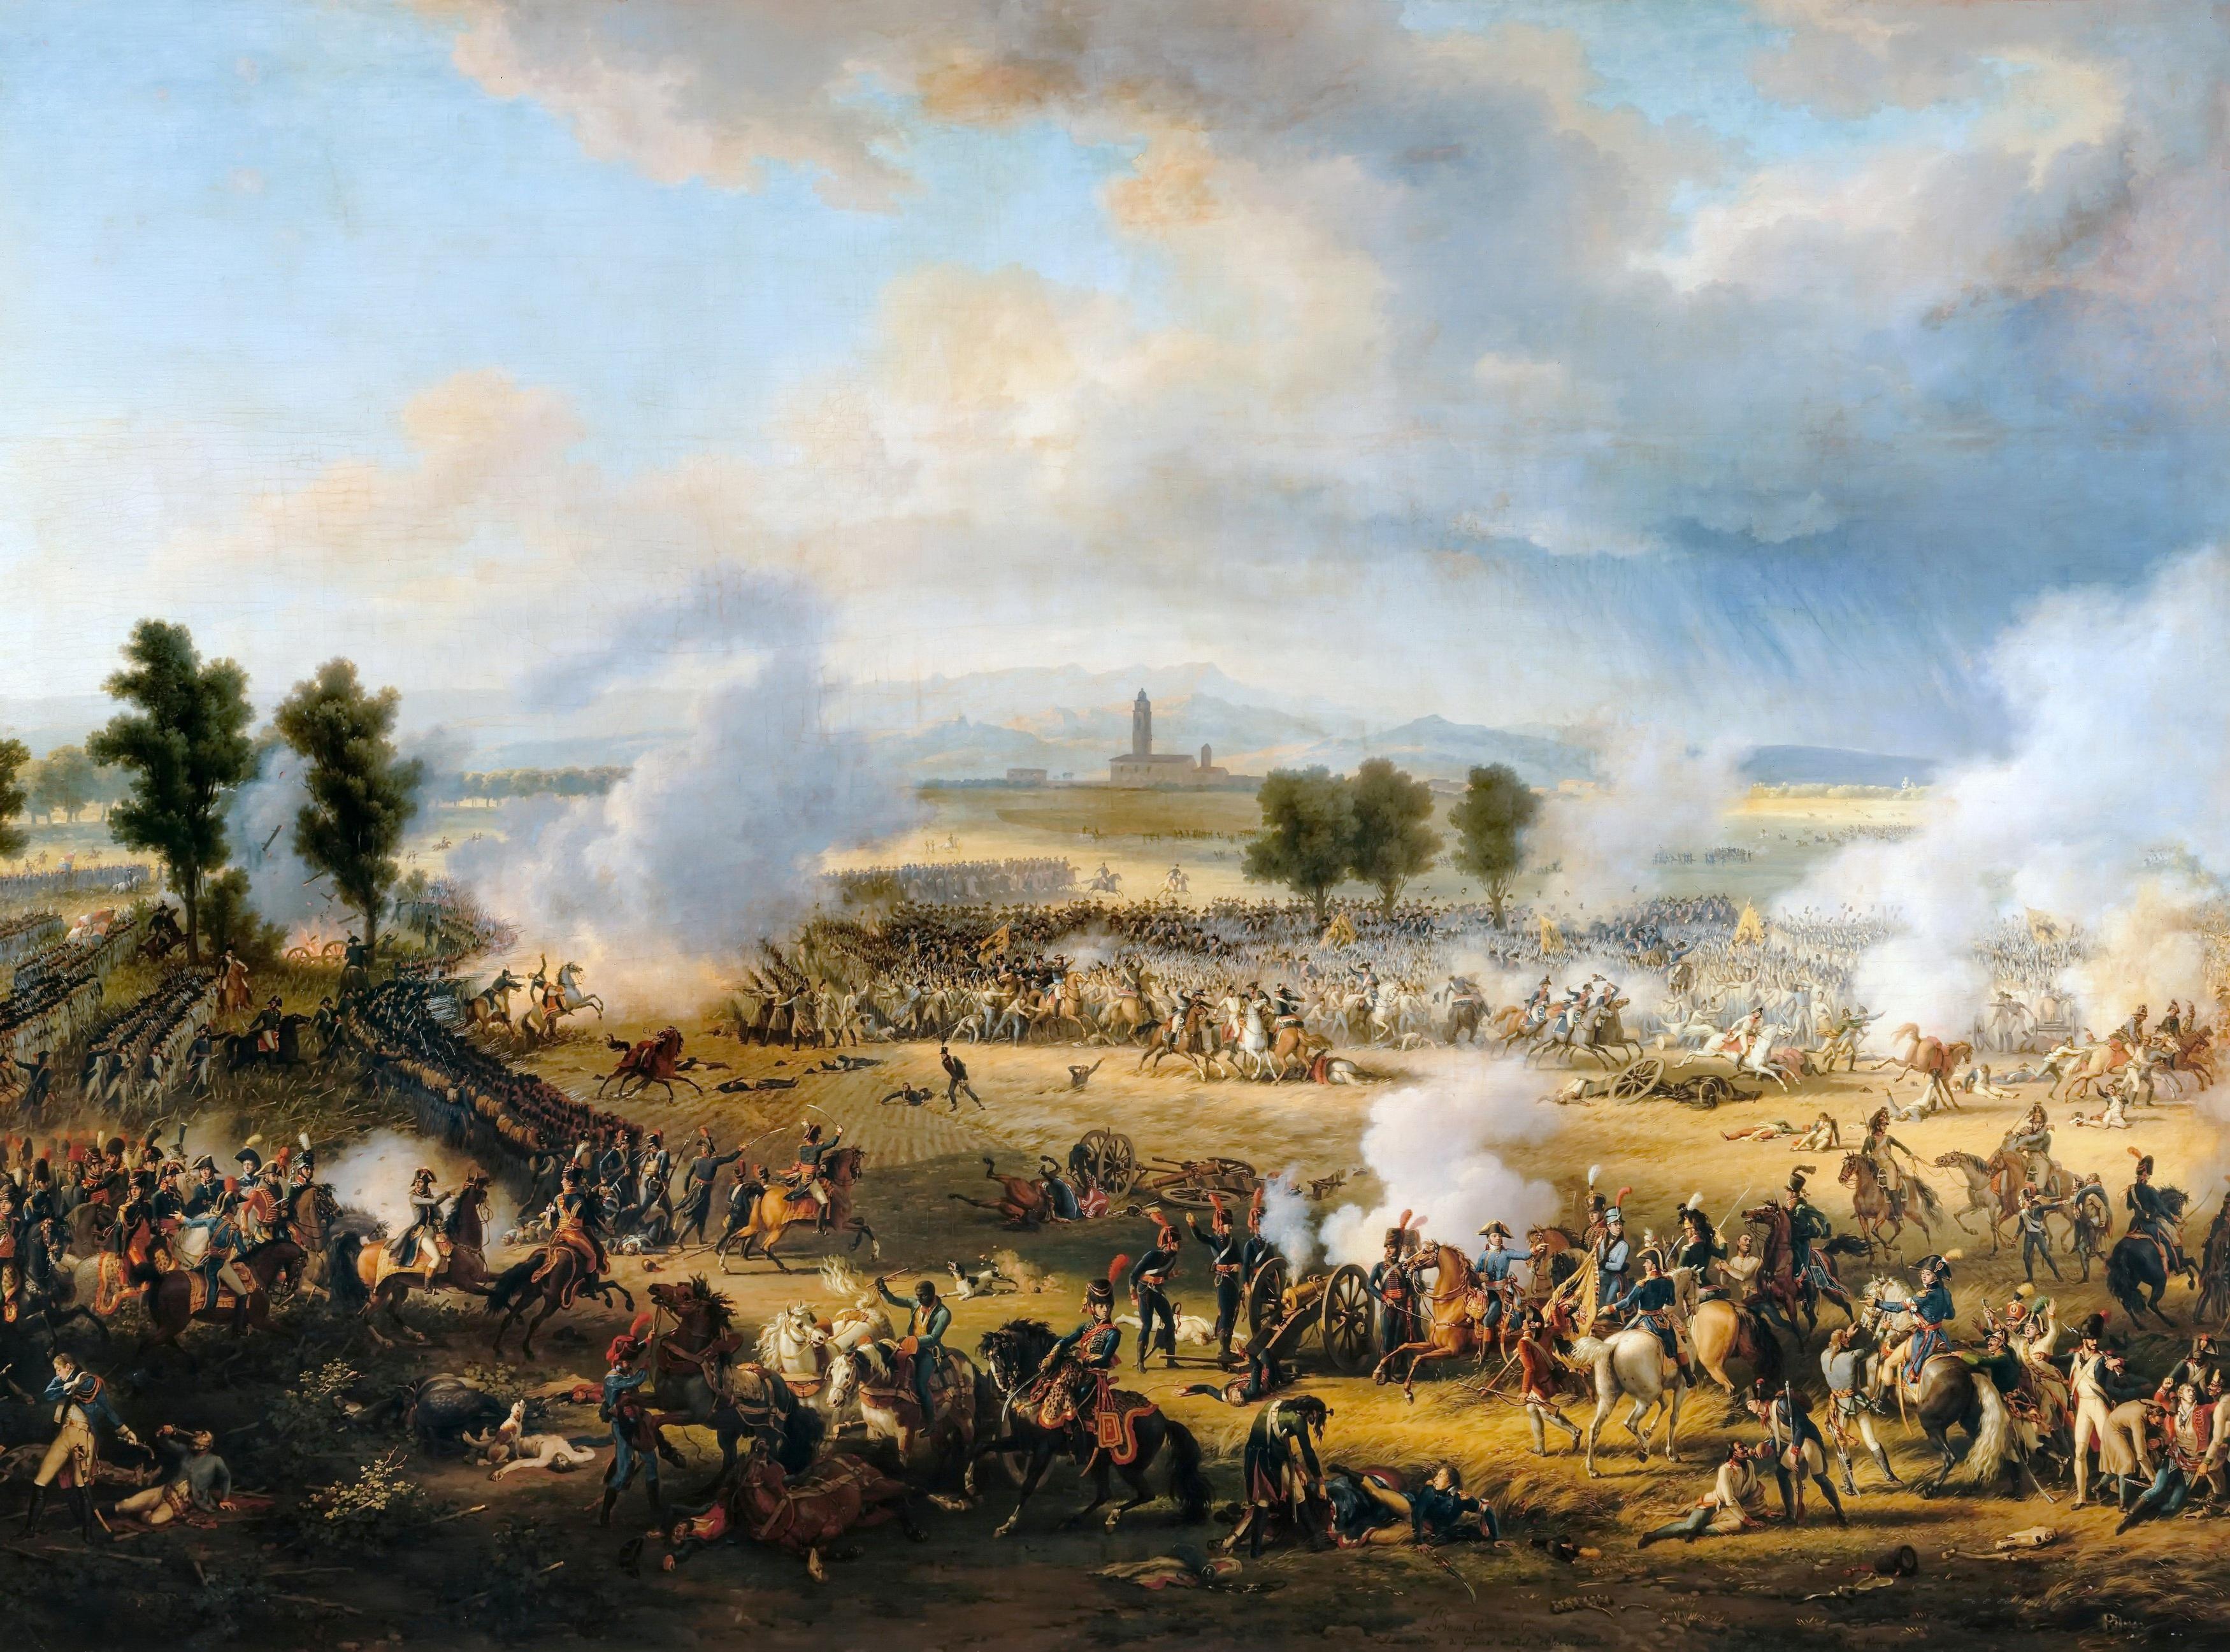 https://upload.wikimedia.org/wikipedia/commons/f/fe/Lejeune_-_Bataille_de_Marengo.jpg